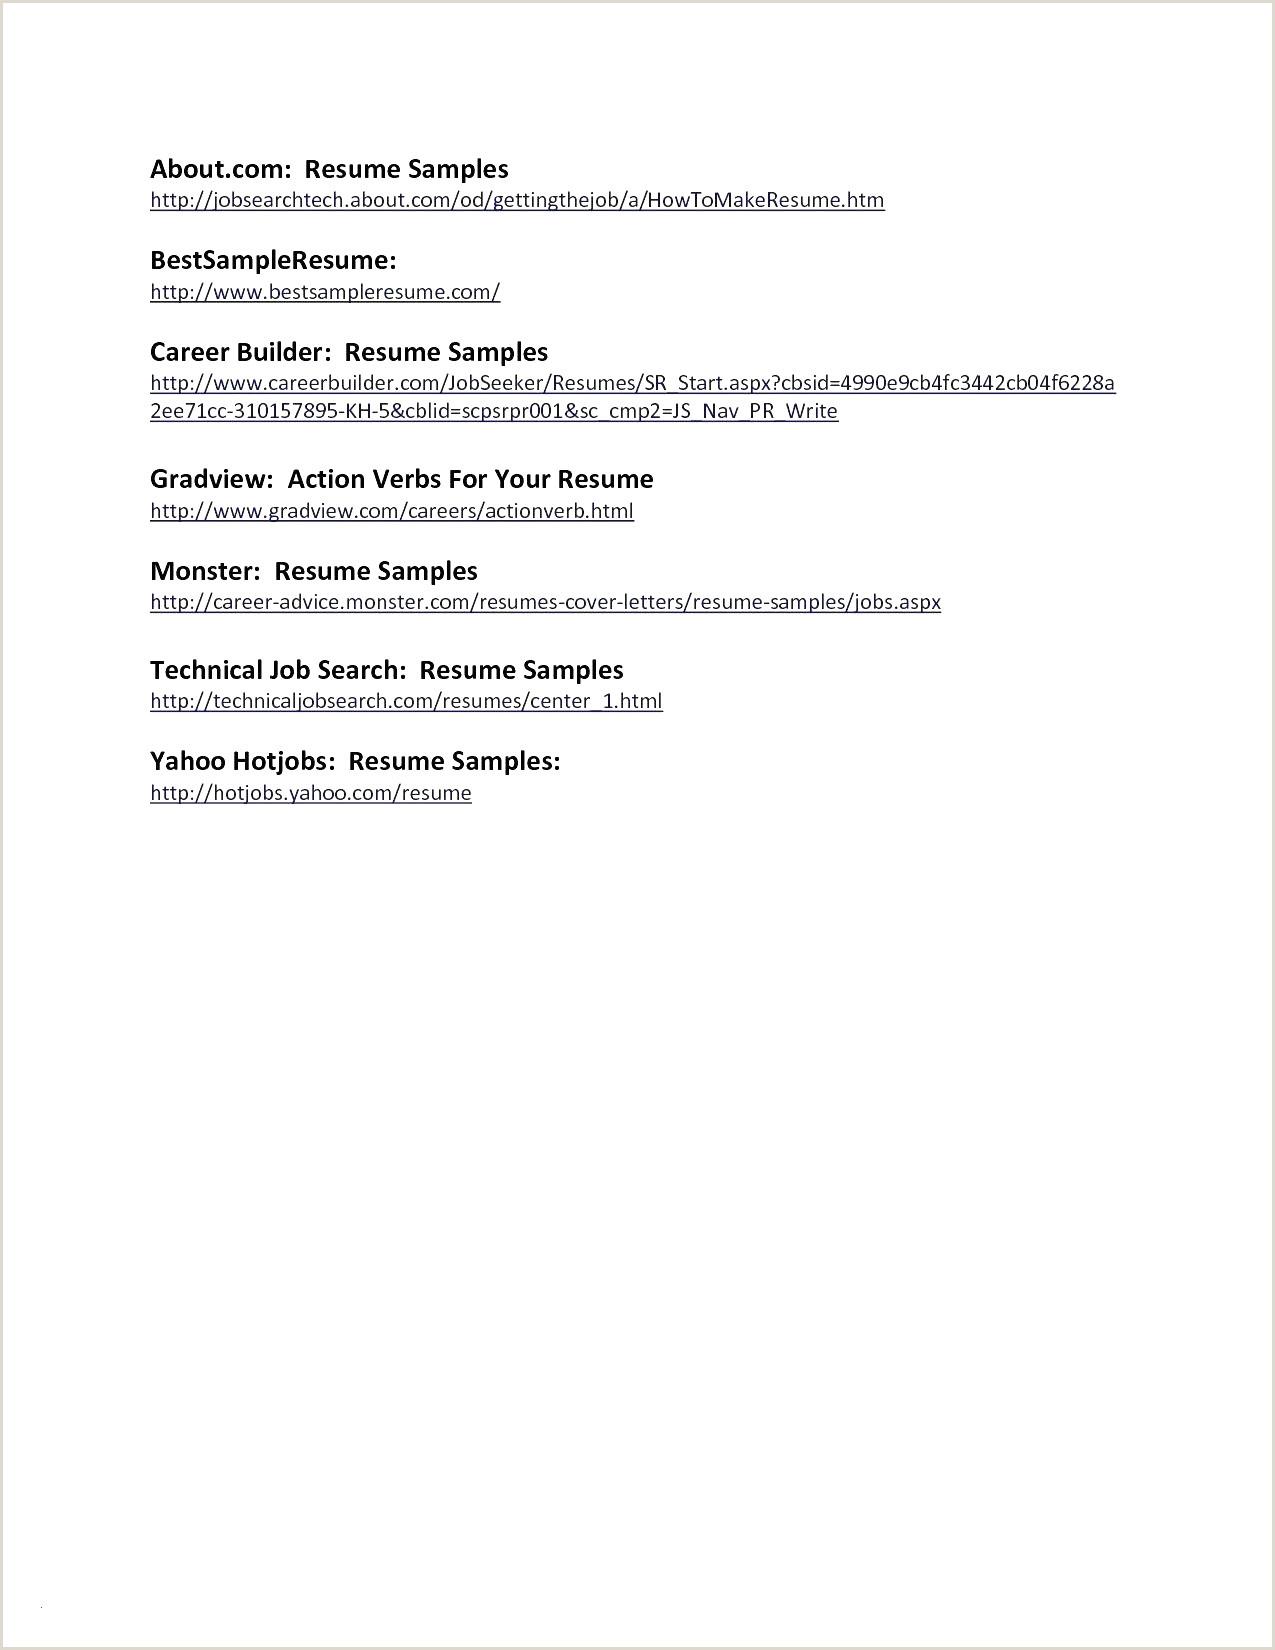 Diploma Fresher Resume Format Doc Best Cv échantillon Inspirierende Lebenslauf Doc Xenakisworld